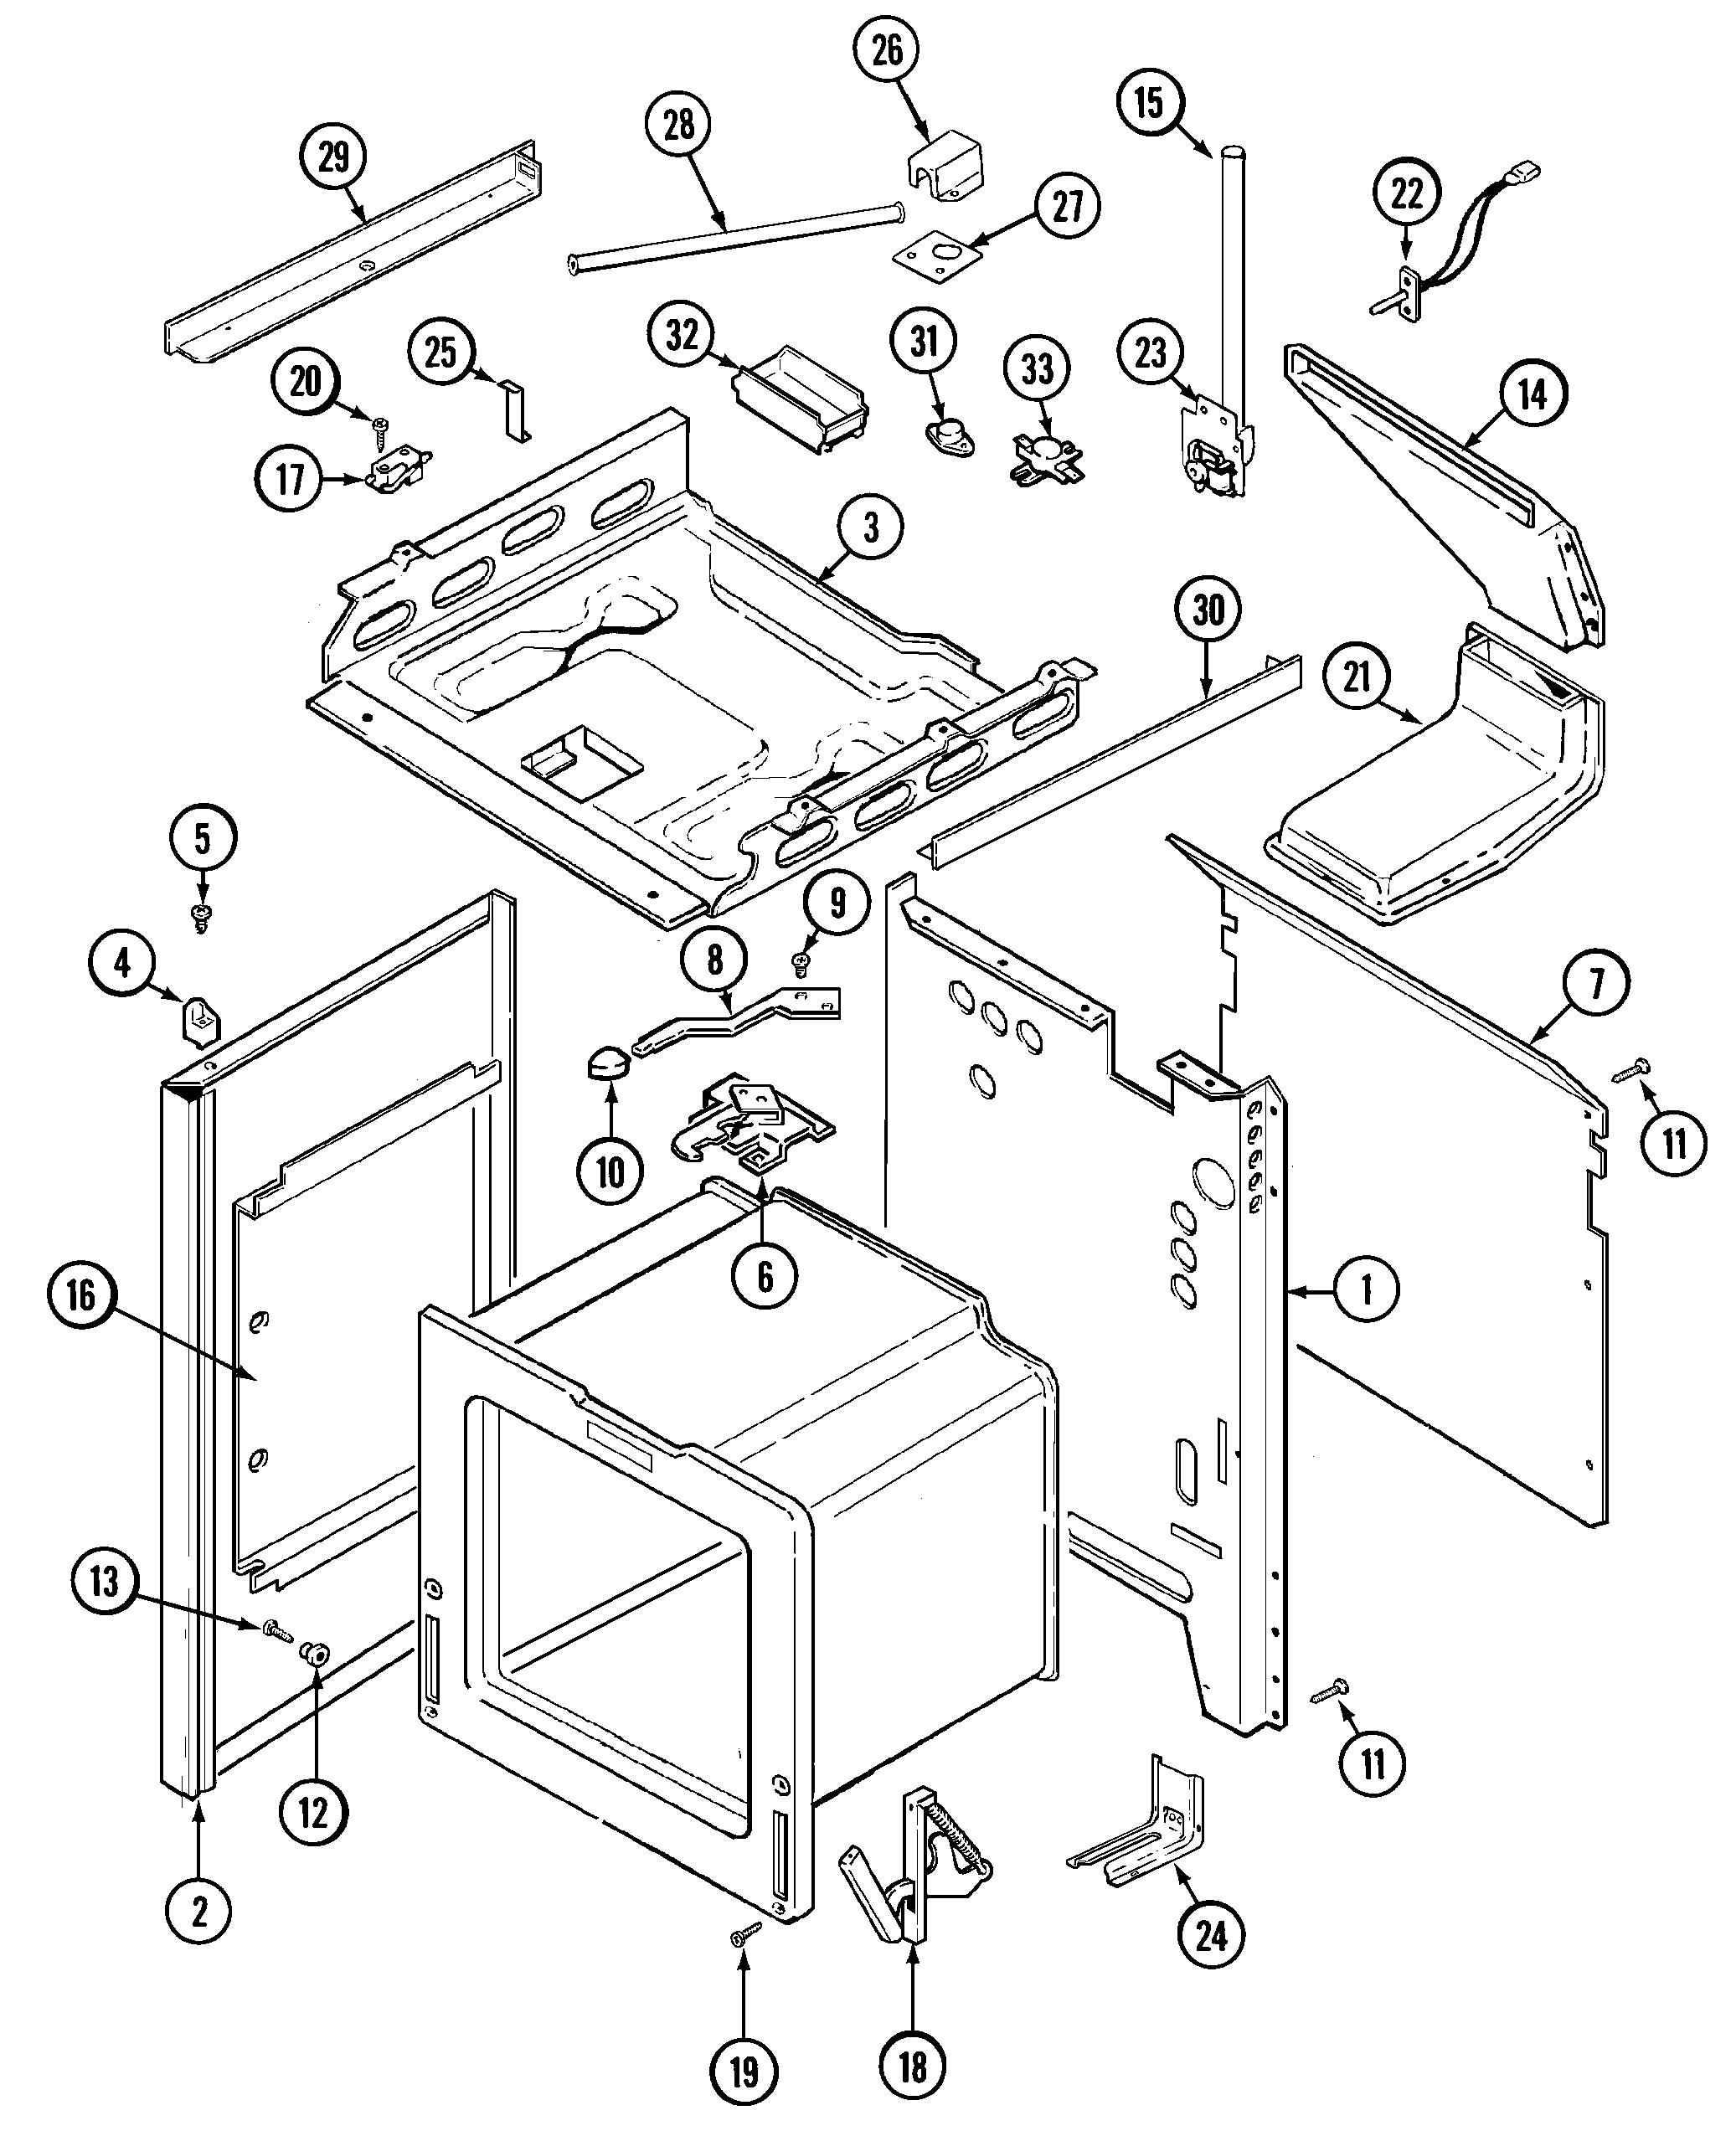 WRG-8908] Magic Chef Range Wiring Diagram on